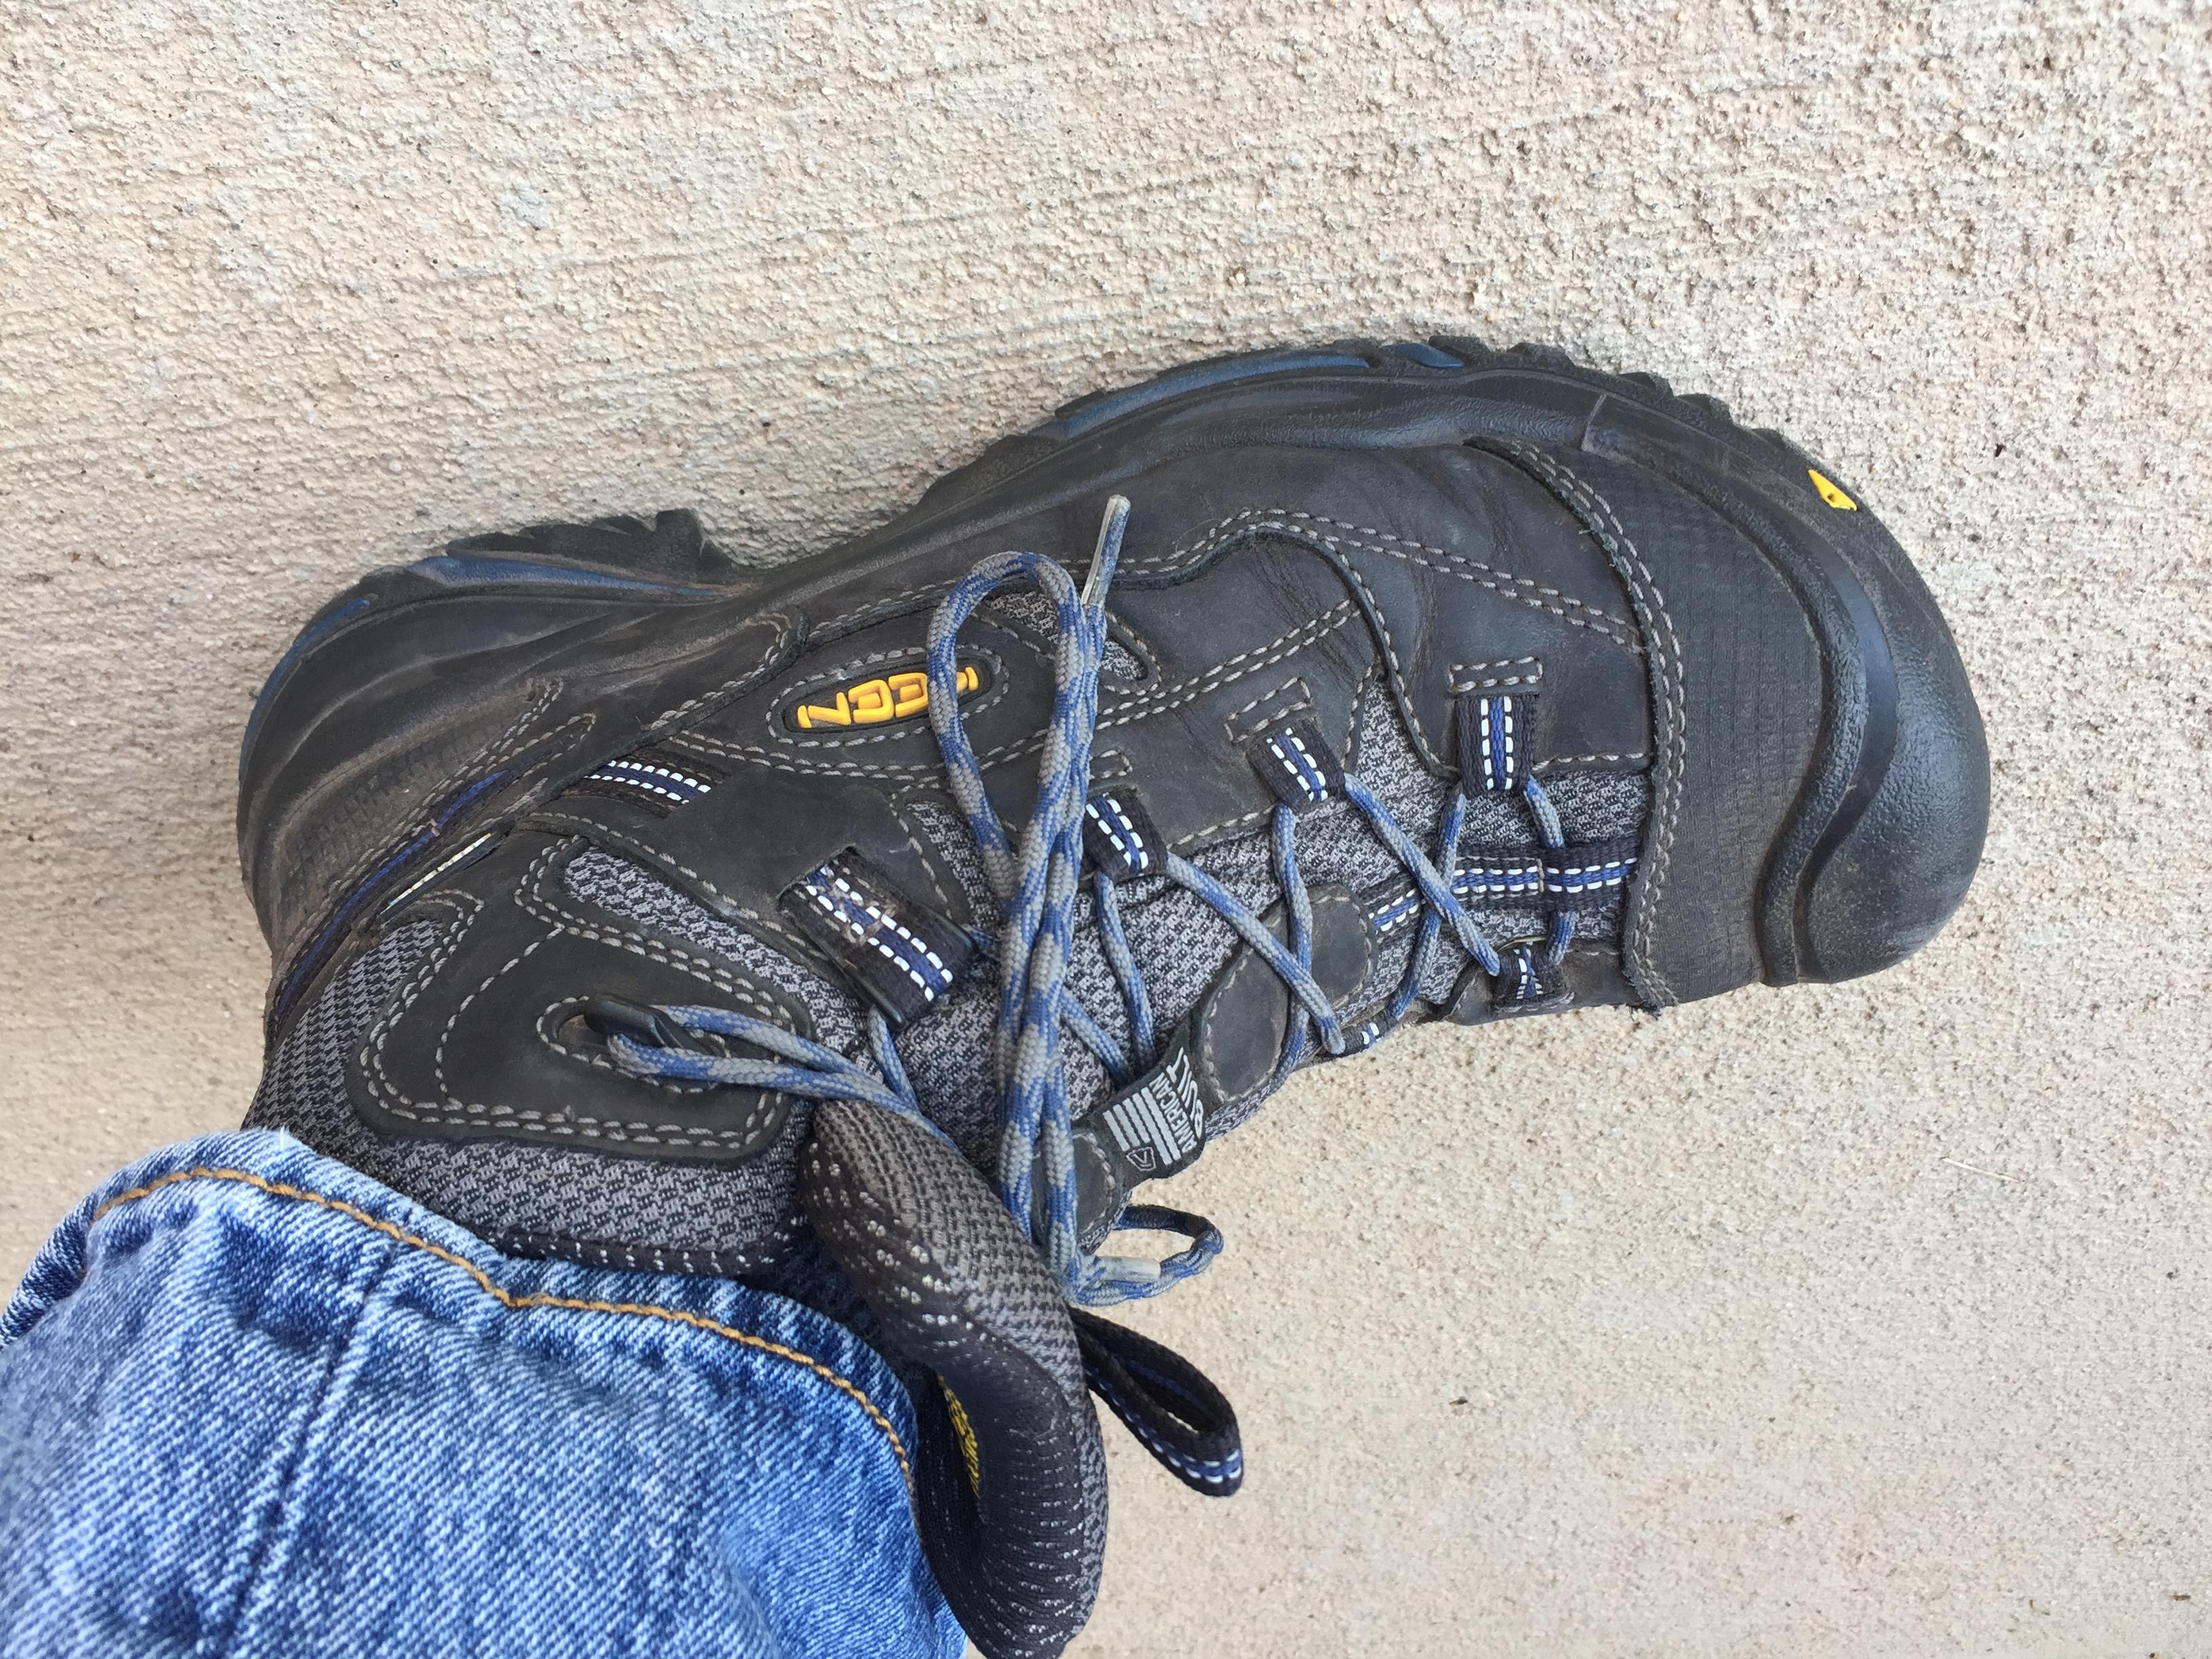 shoes work for com marketyourbookblog boots floors gallery x concrete best